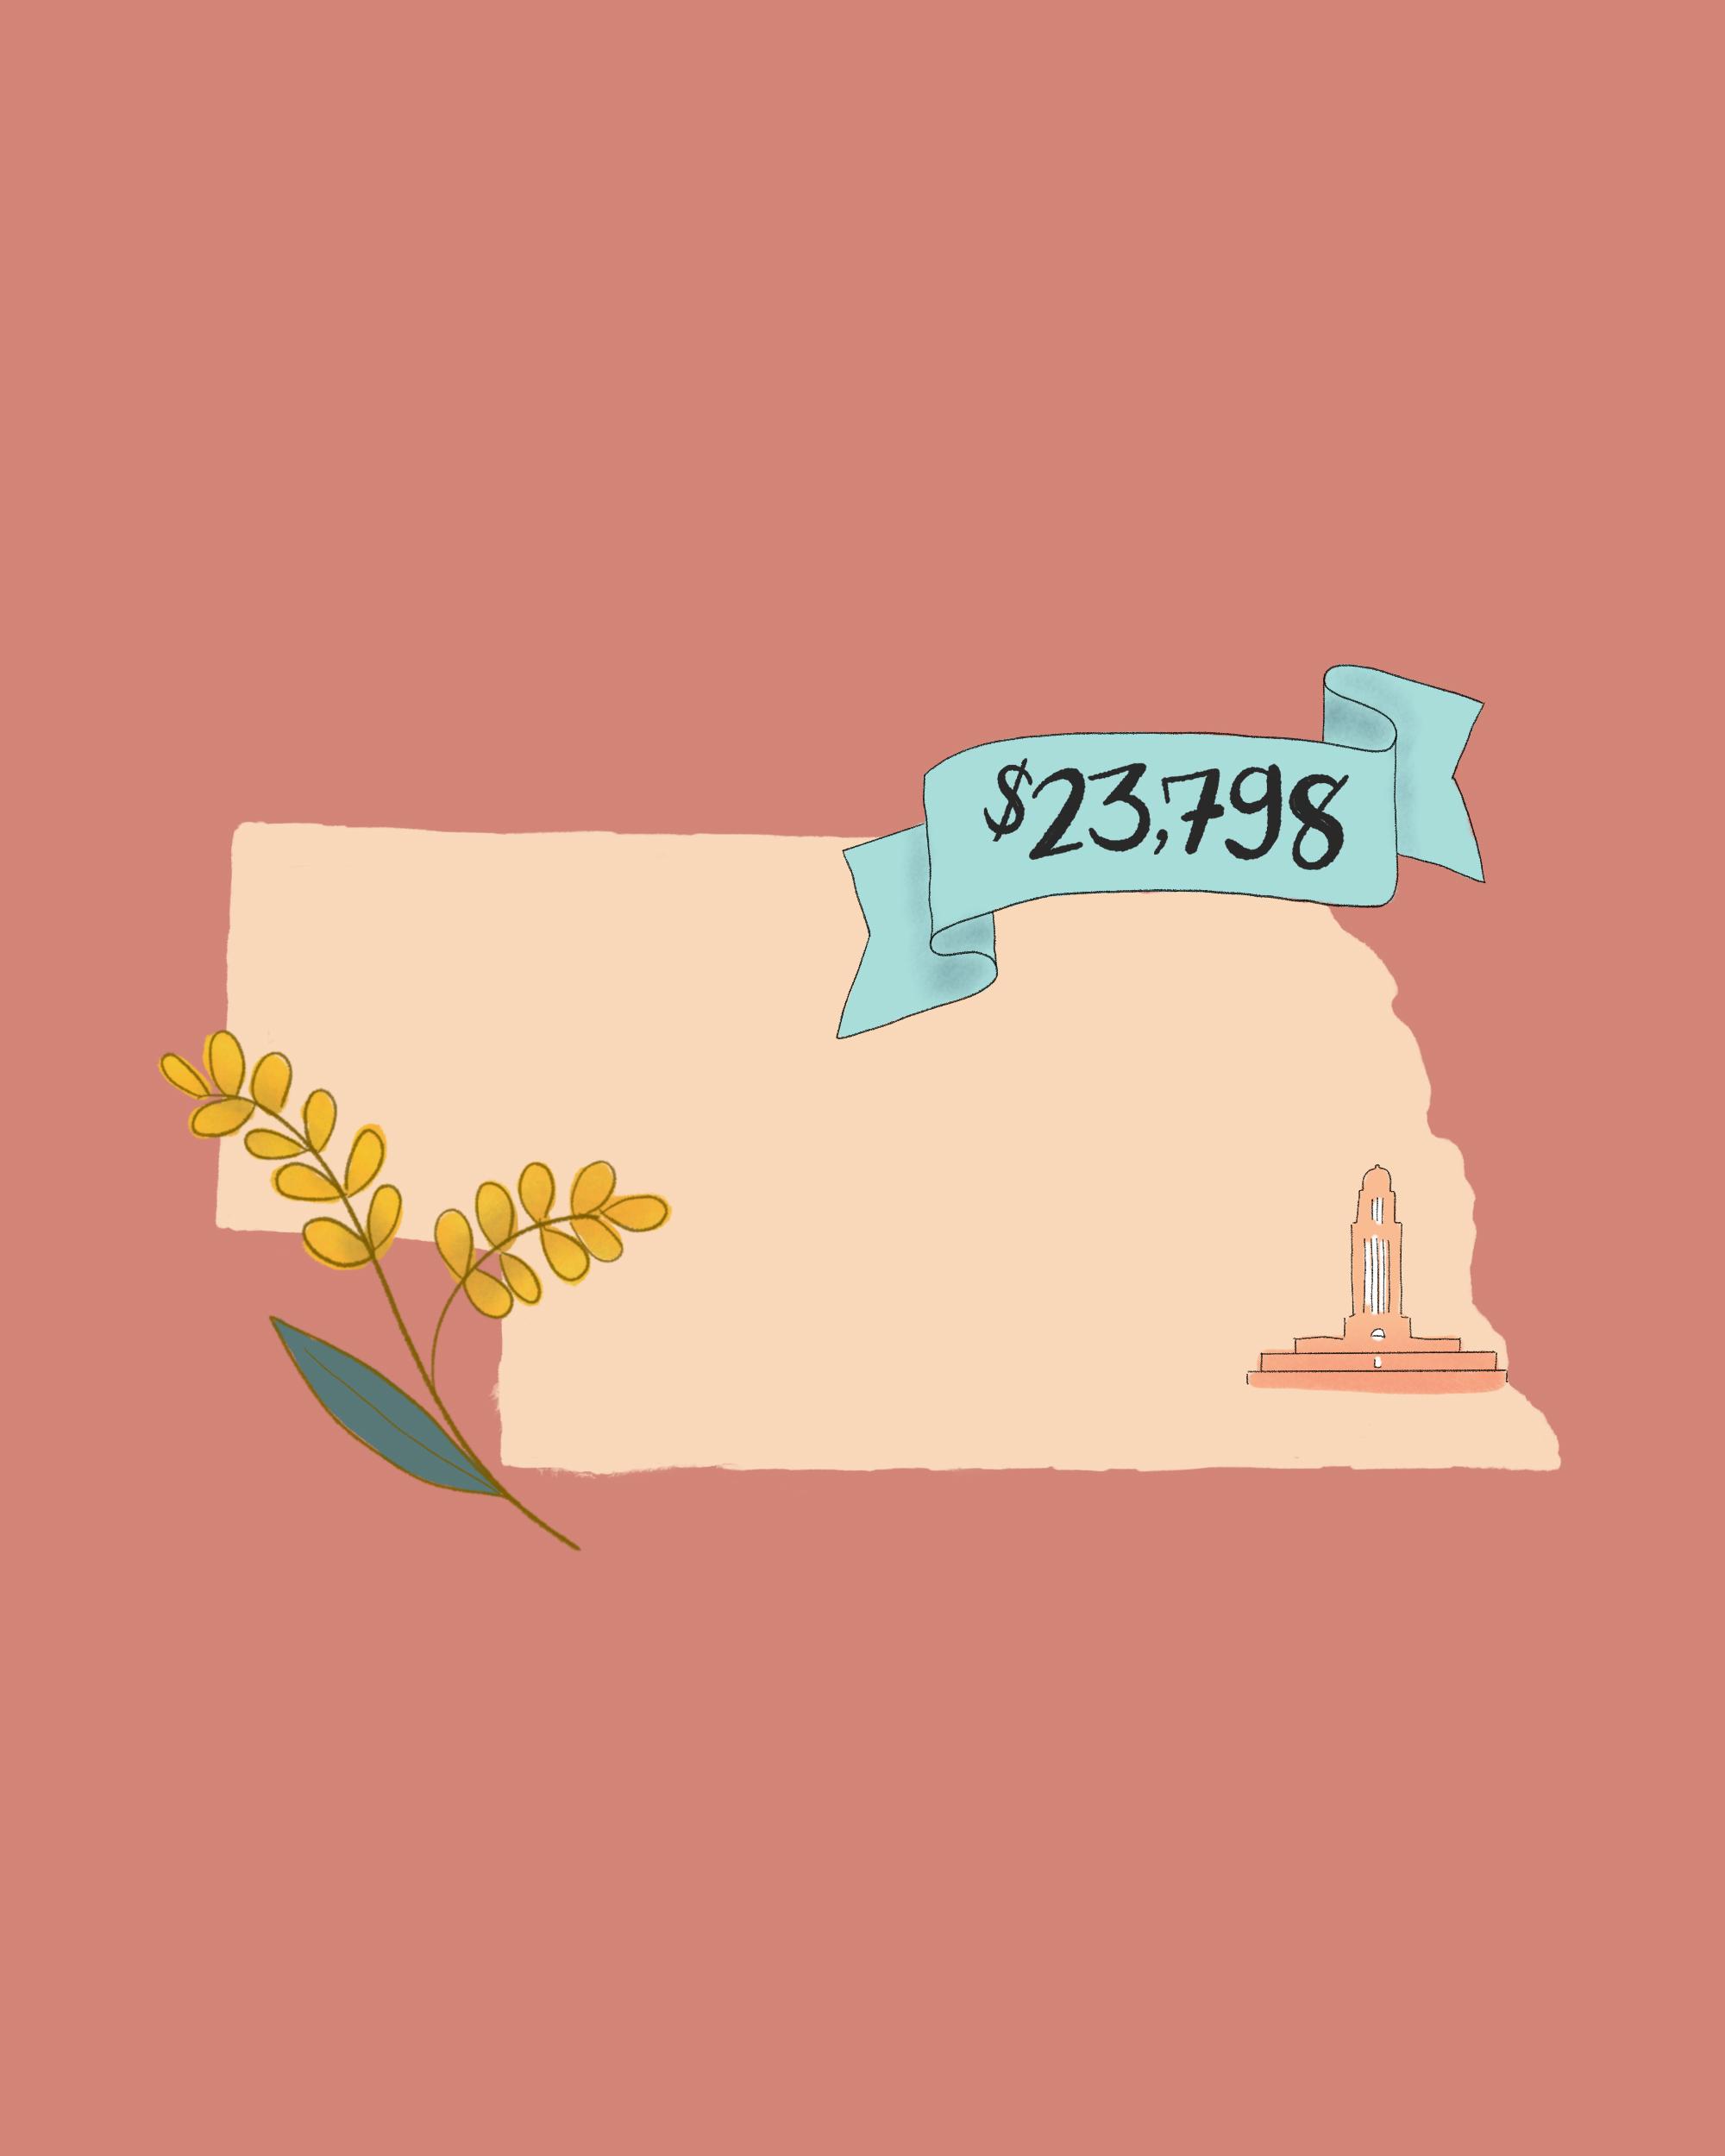 state wedding costs illustration nebraska